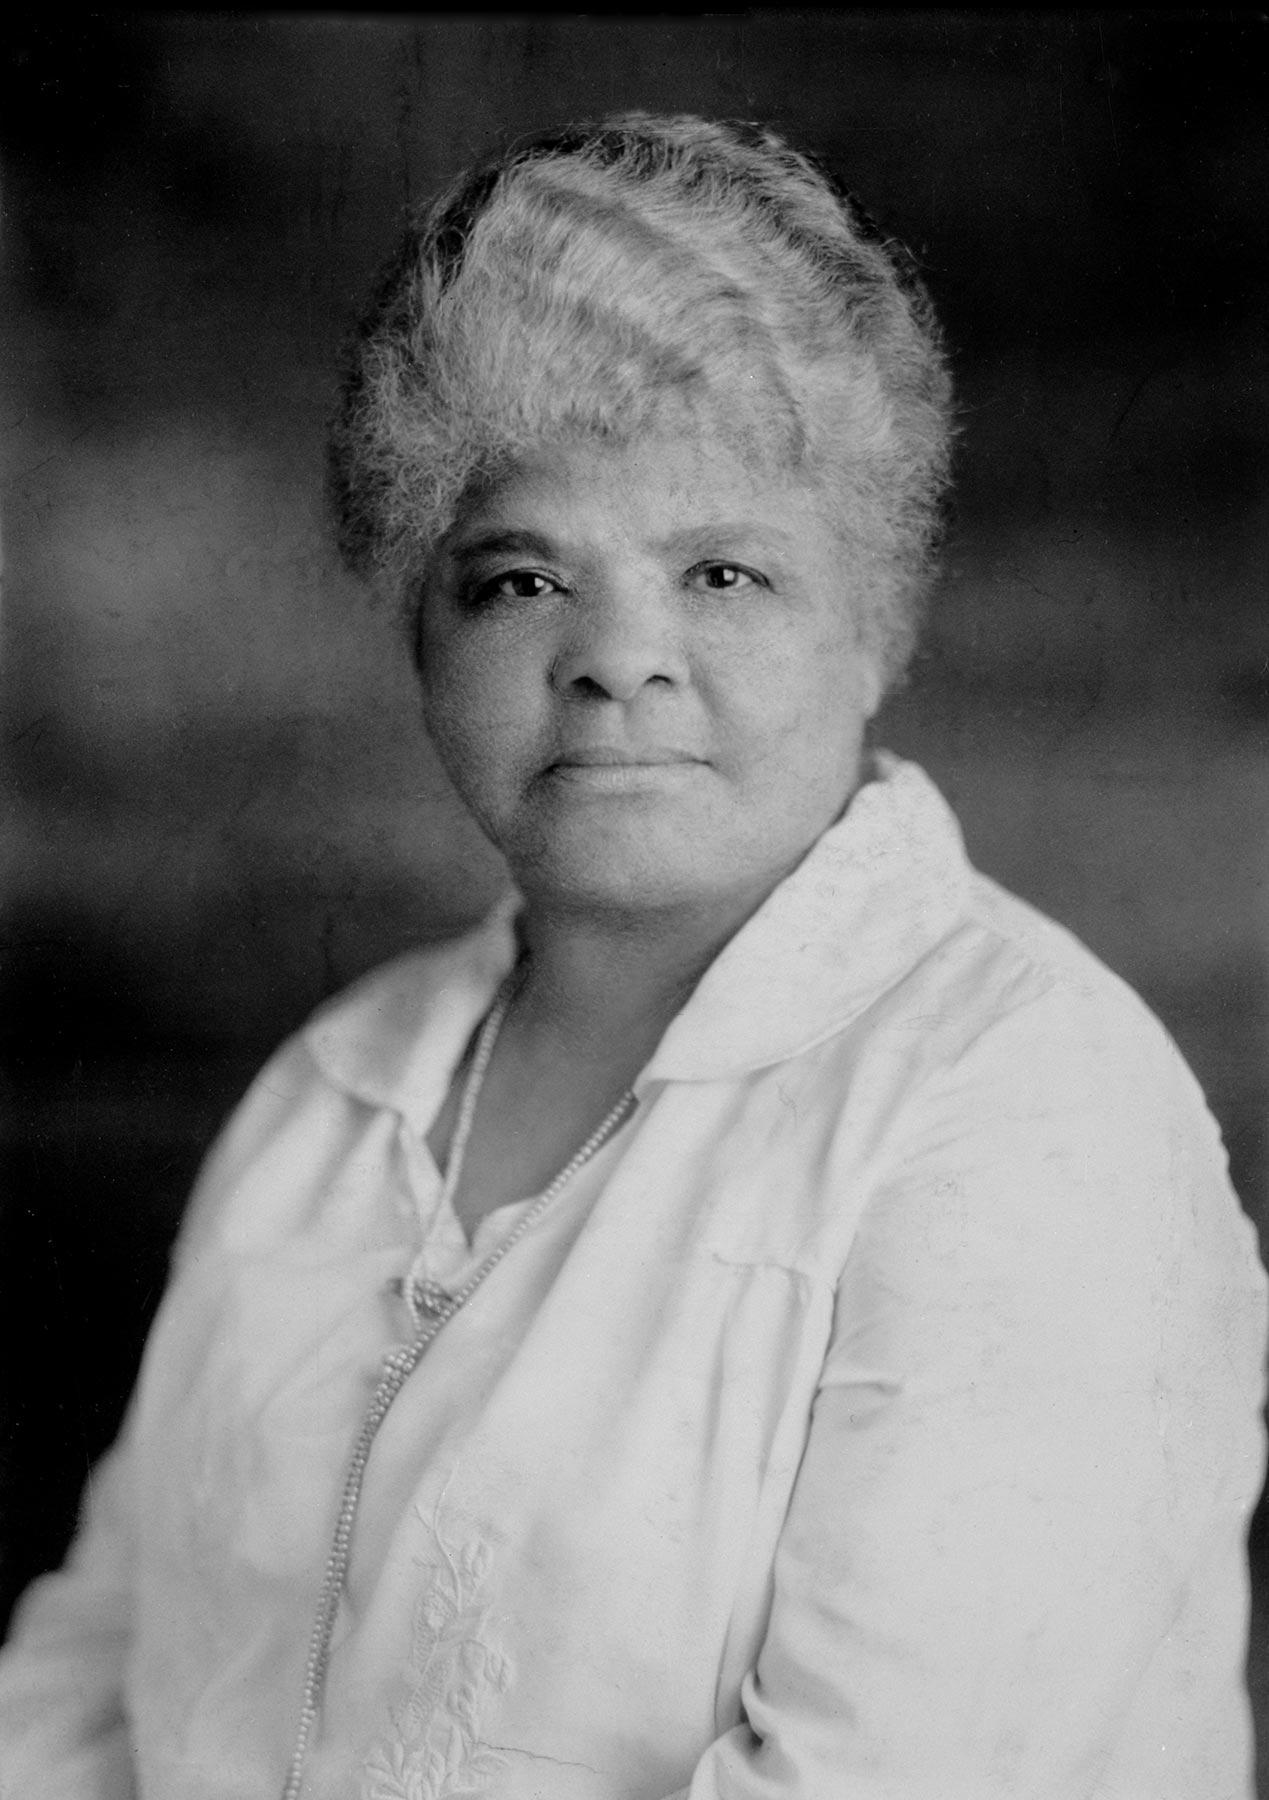 Ida B. Wells Barnett. Courtesy of Chicago History Museum, i12868.